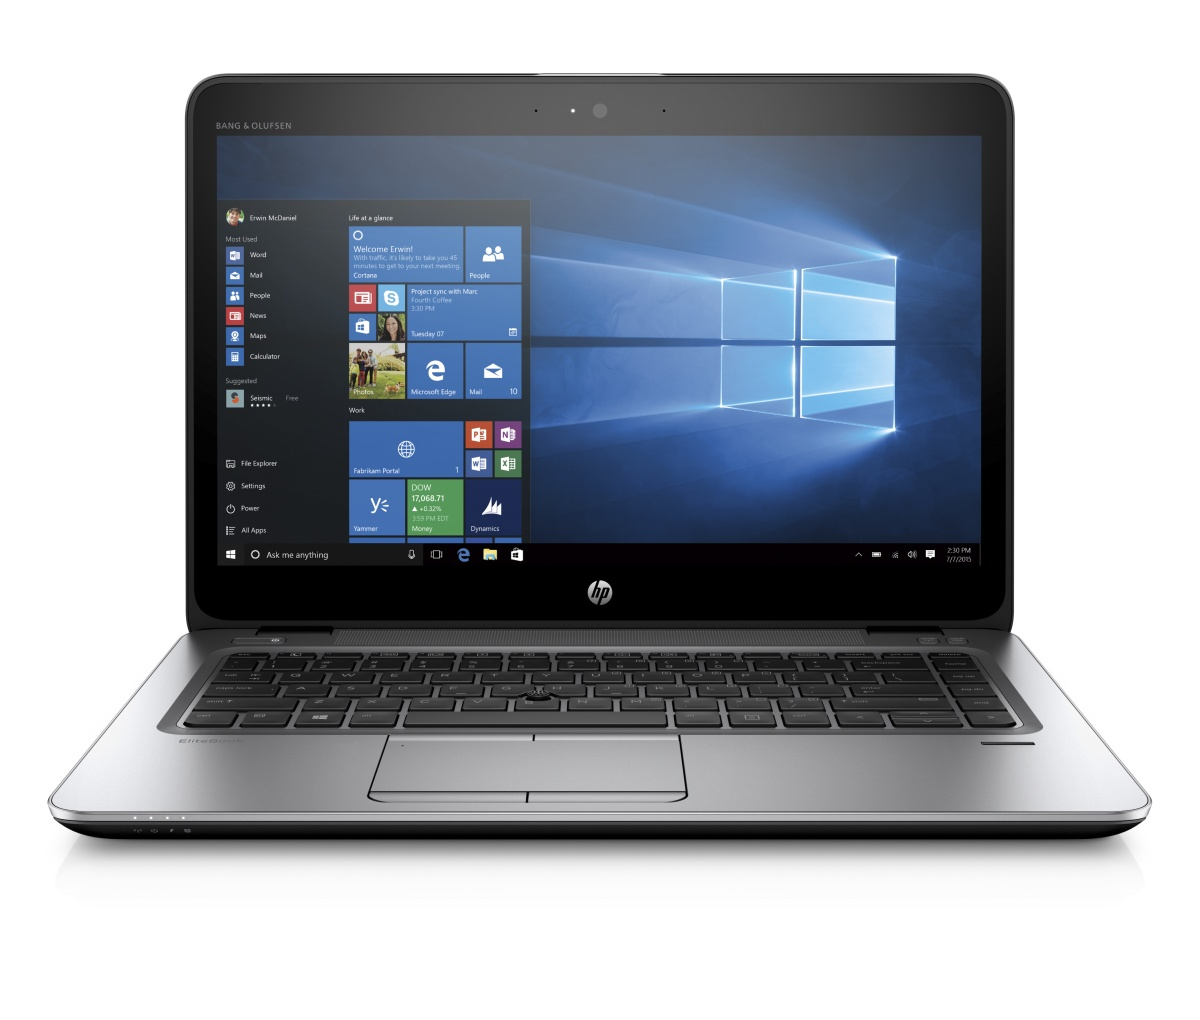 "HP EliteBook 840 G3 14"" QHD /i7-6500U/8GB/512SSD/WIFI/BT/MCR/FPR/3RServis/7+10P"